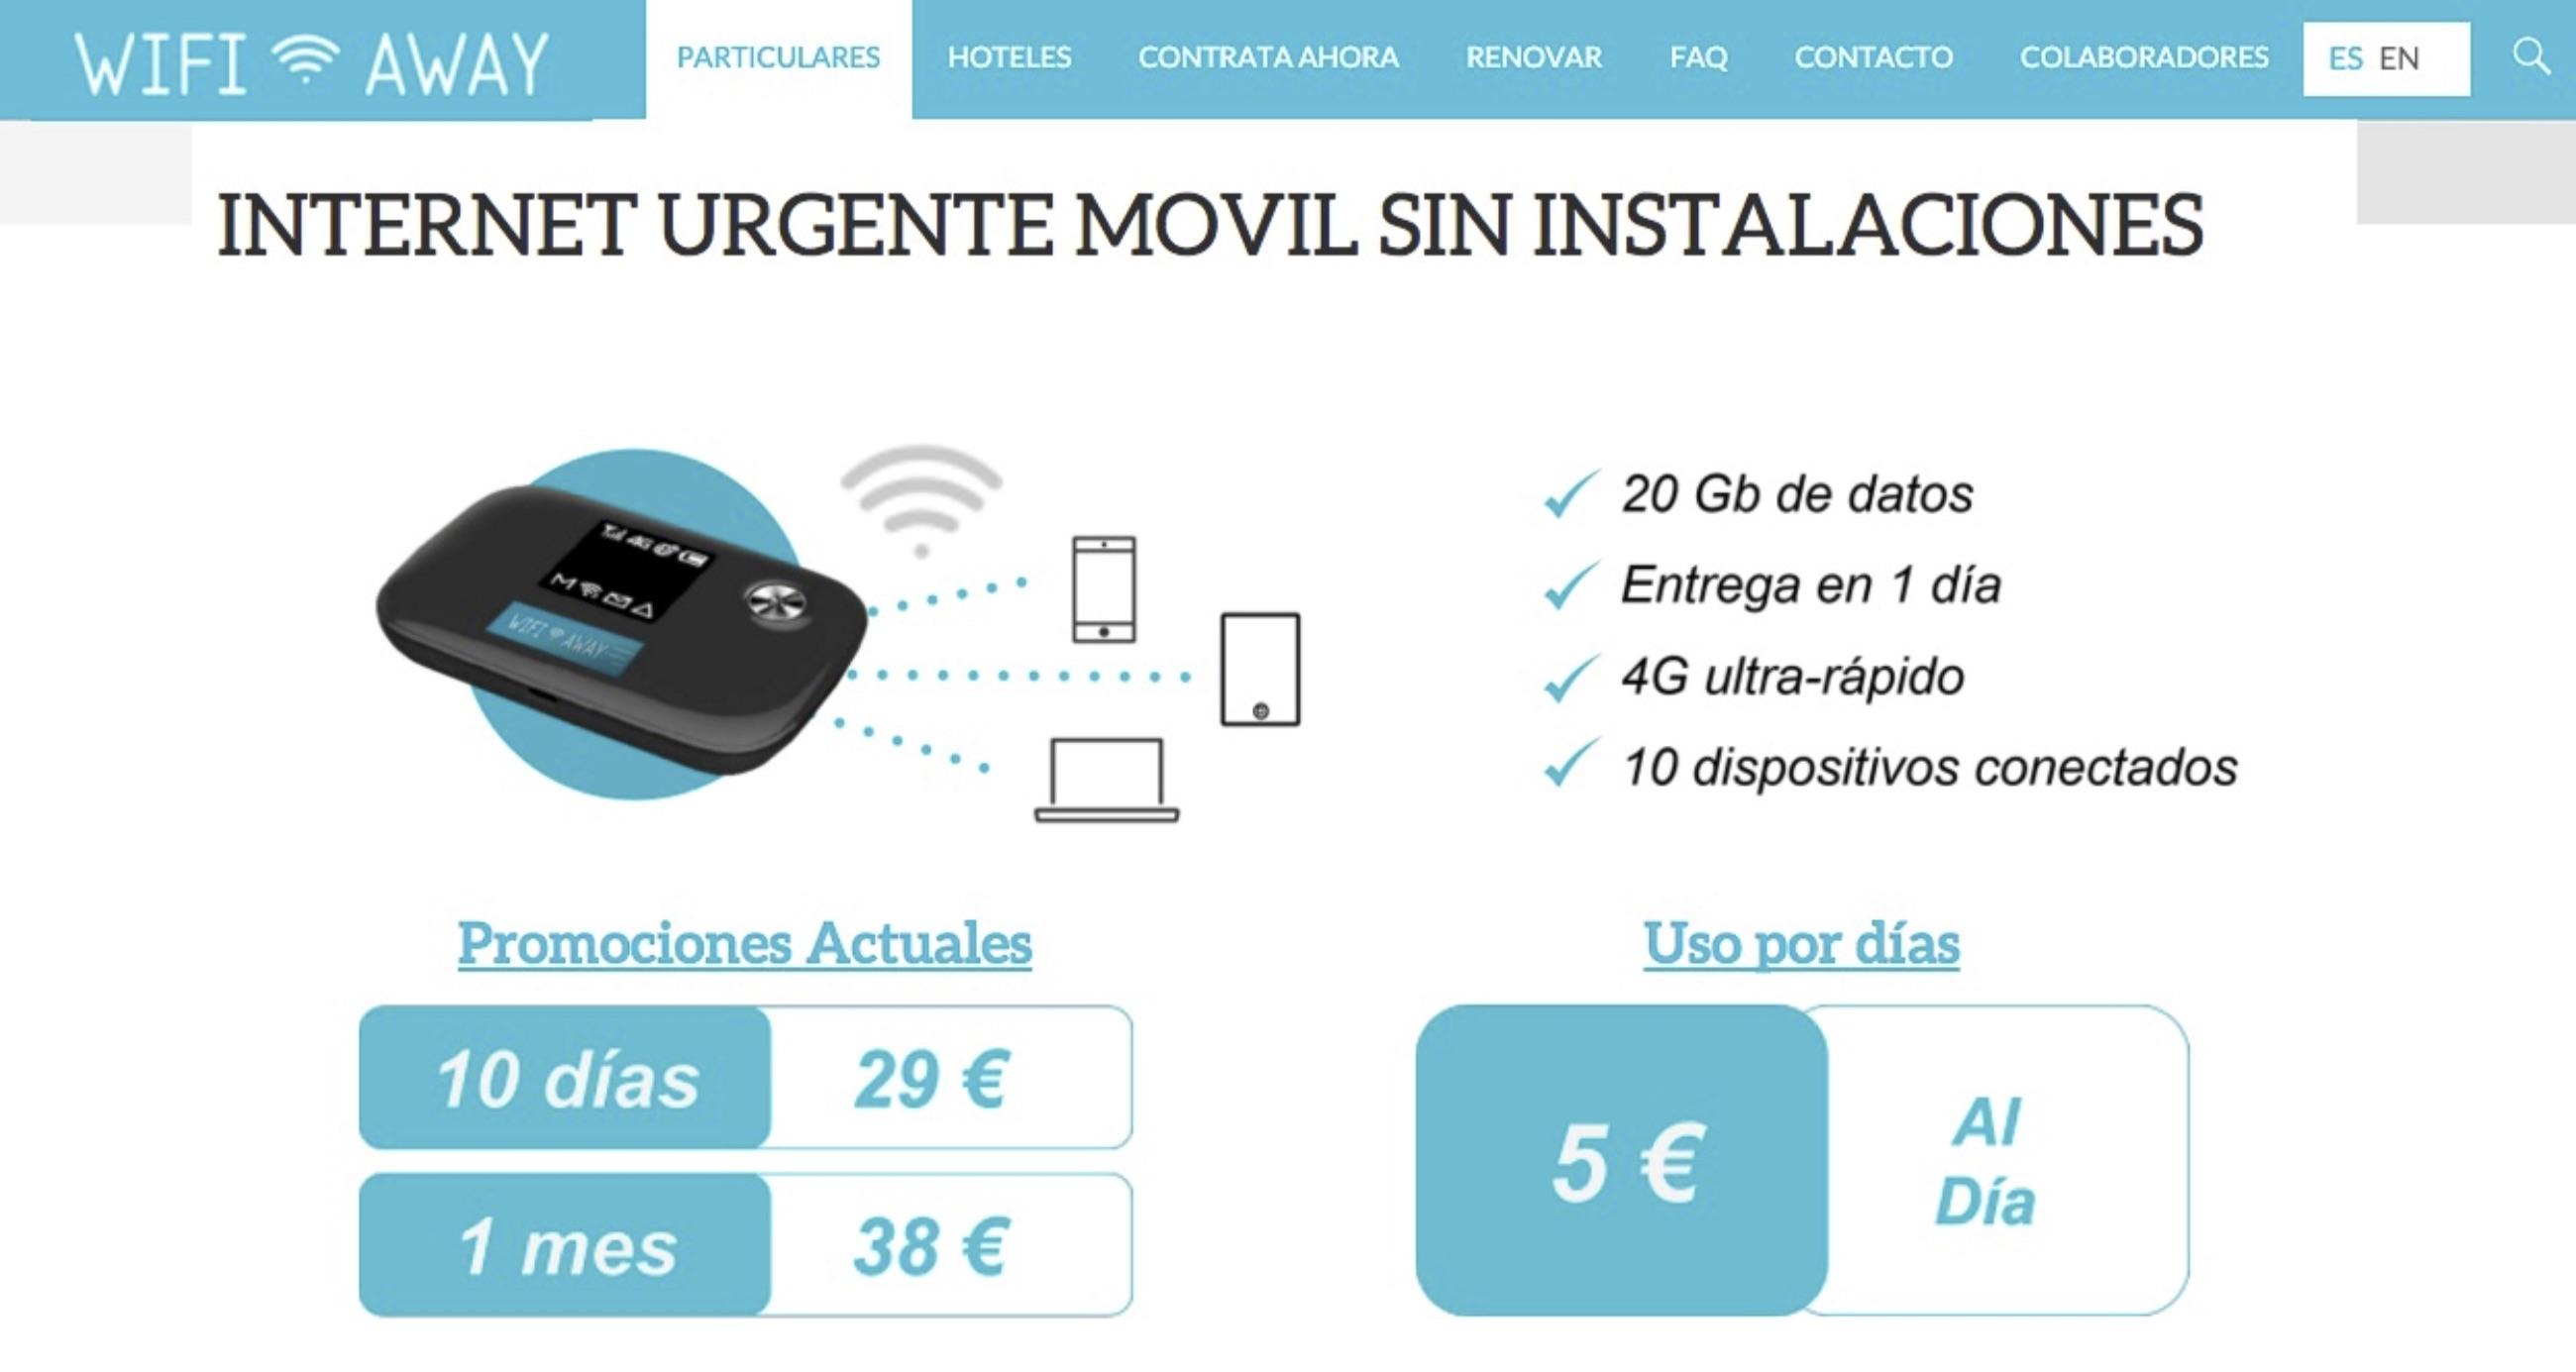 WifiAway, internet urgente móvil